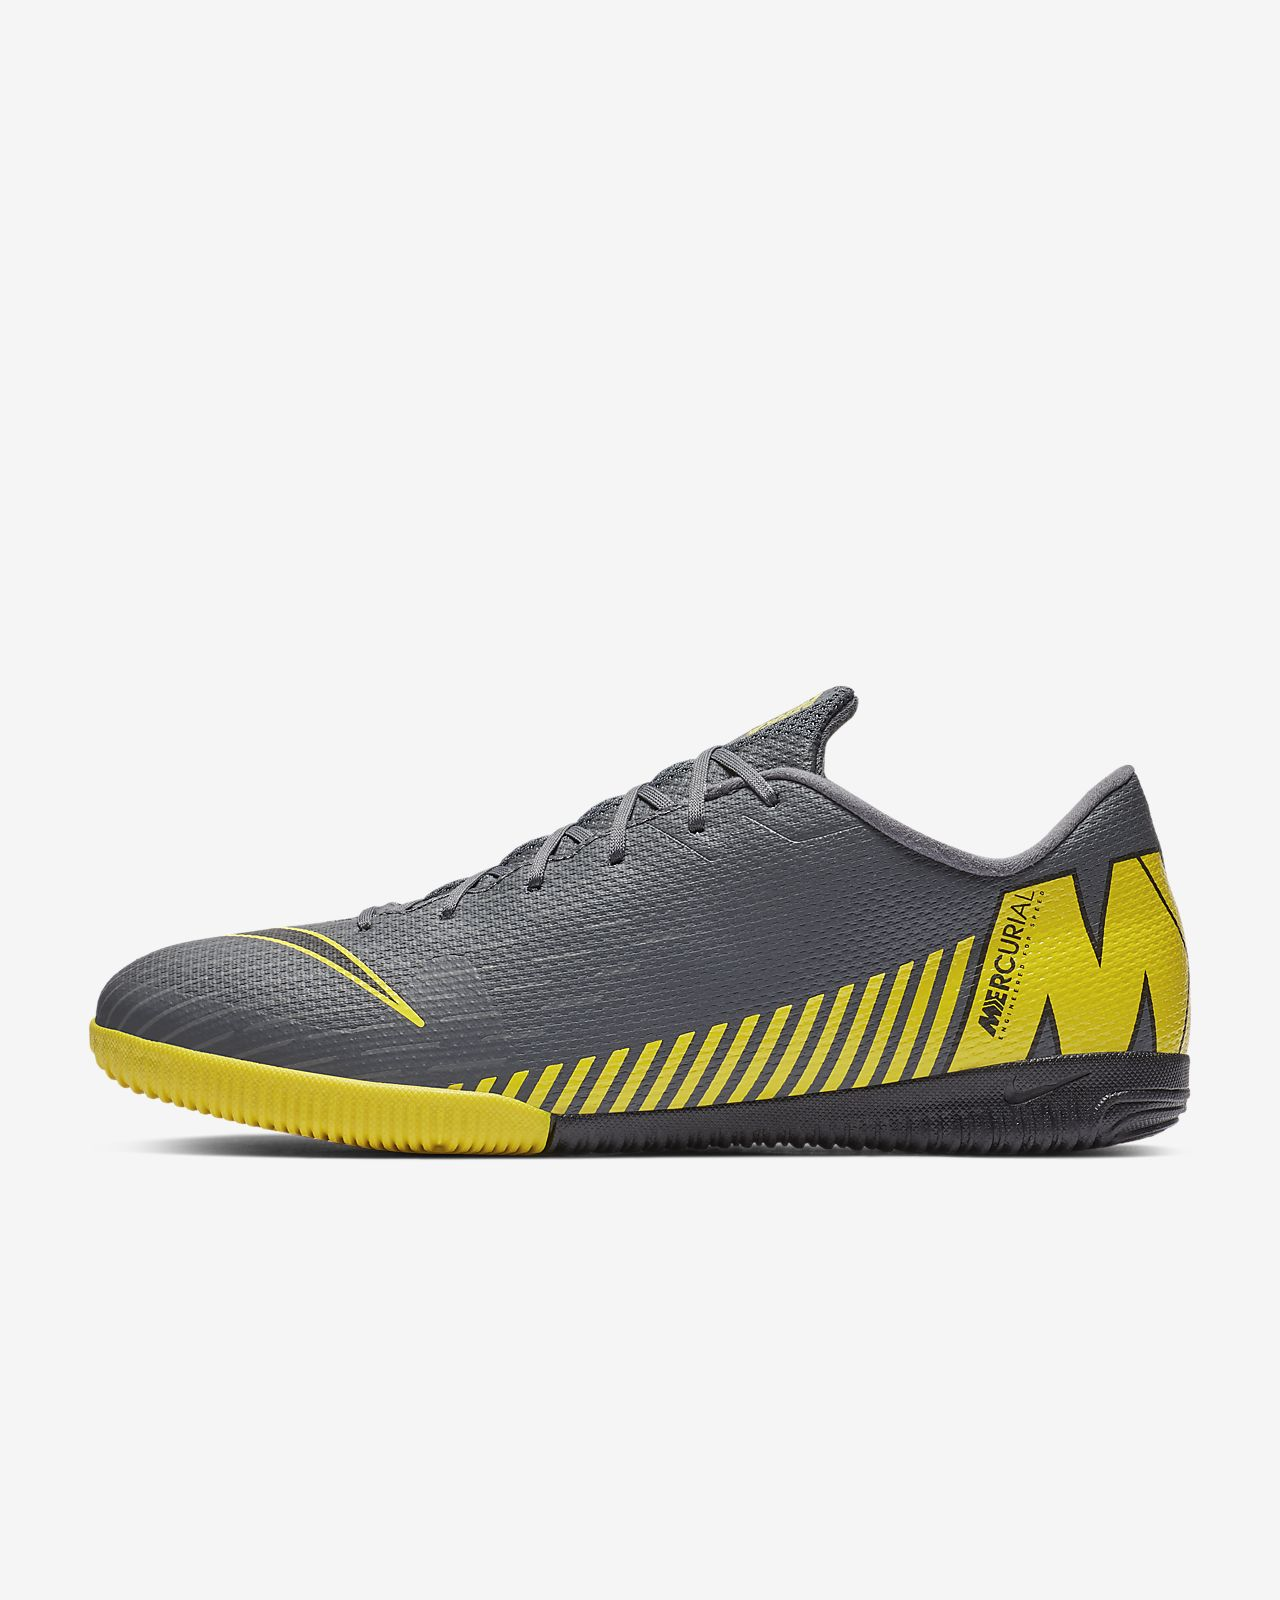 promo code 0dd24 80227 Nike VaporX 12 Academy IC Botas de fútbol sala